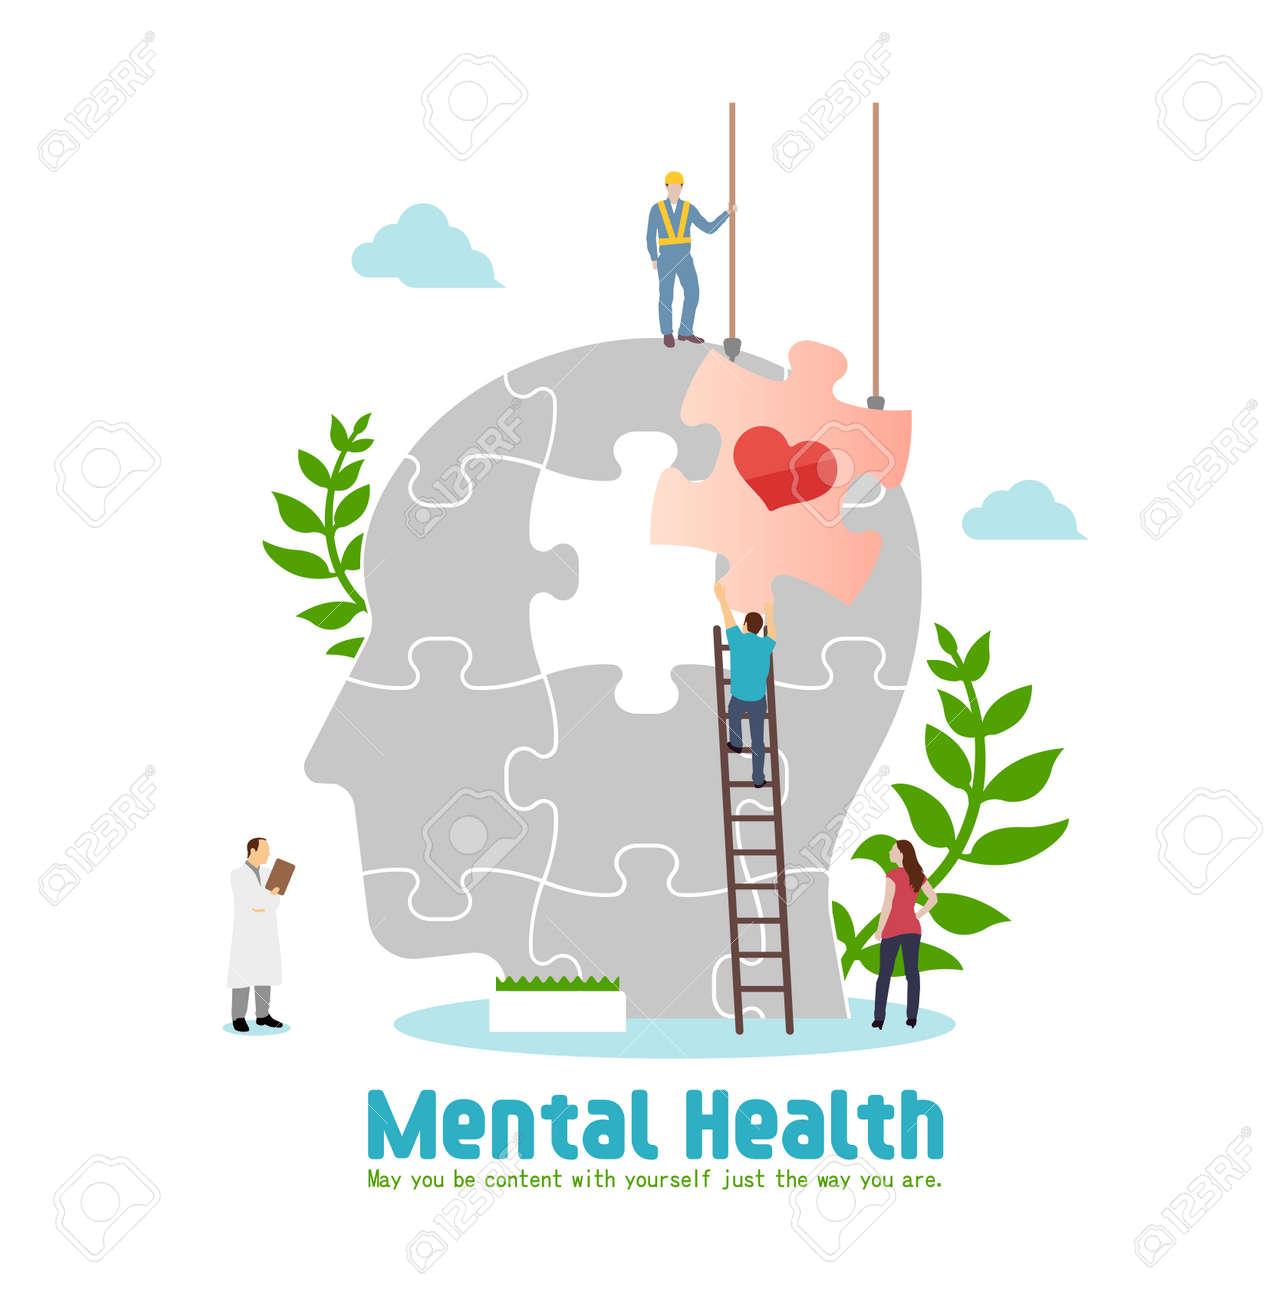 Mental health concept flat vector illustration - 169249490